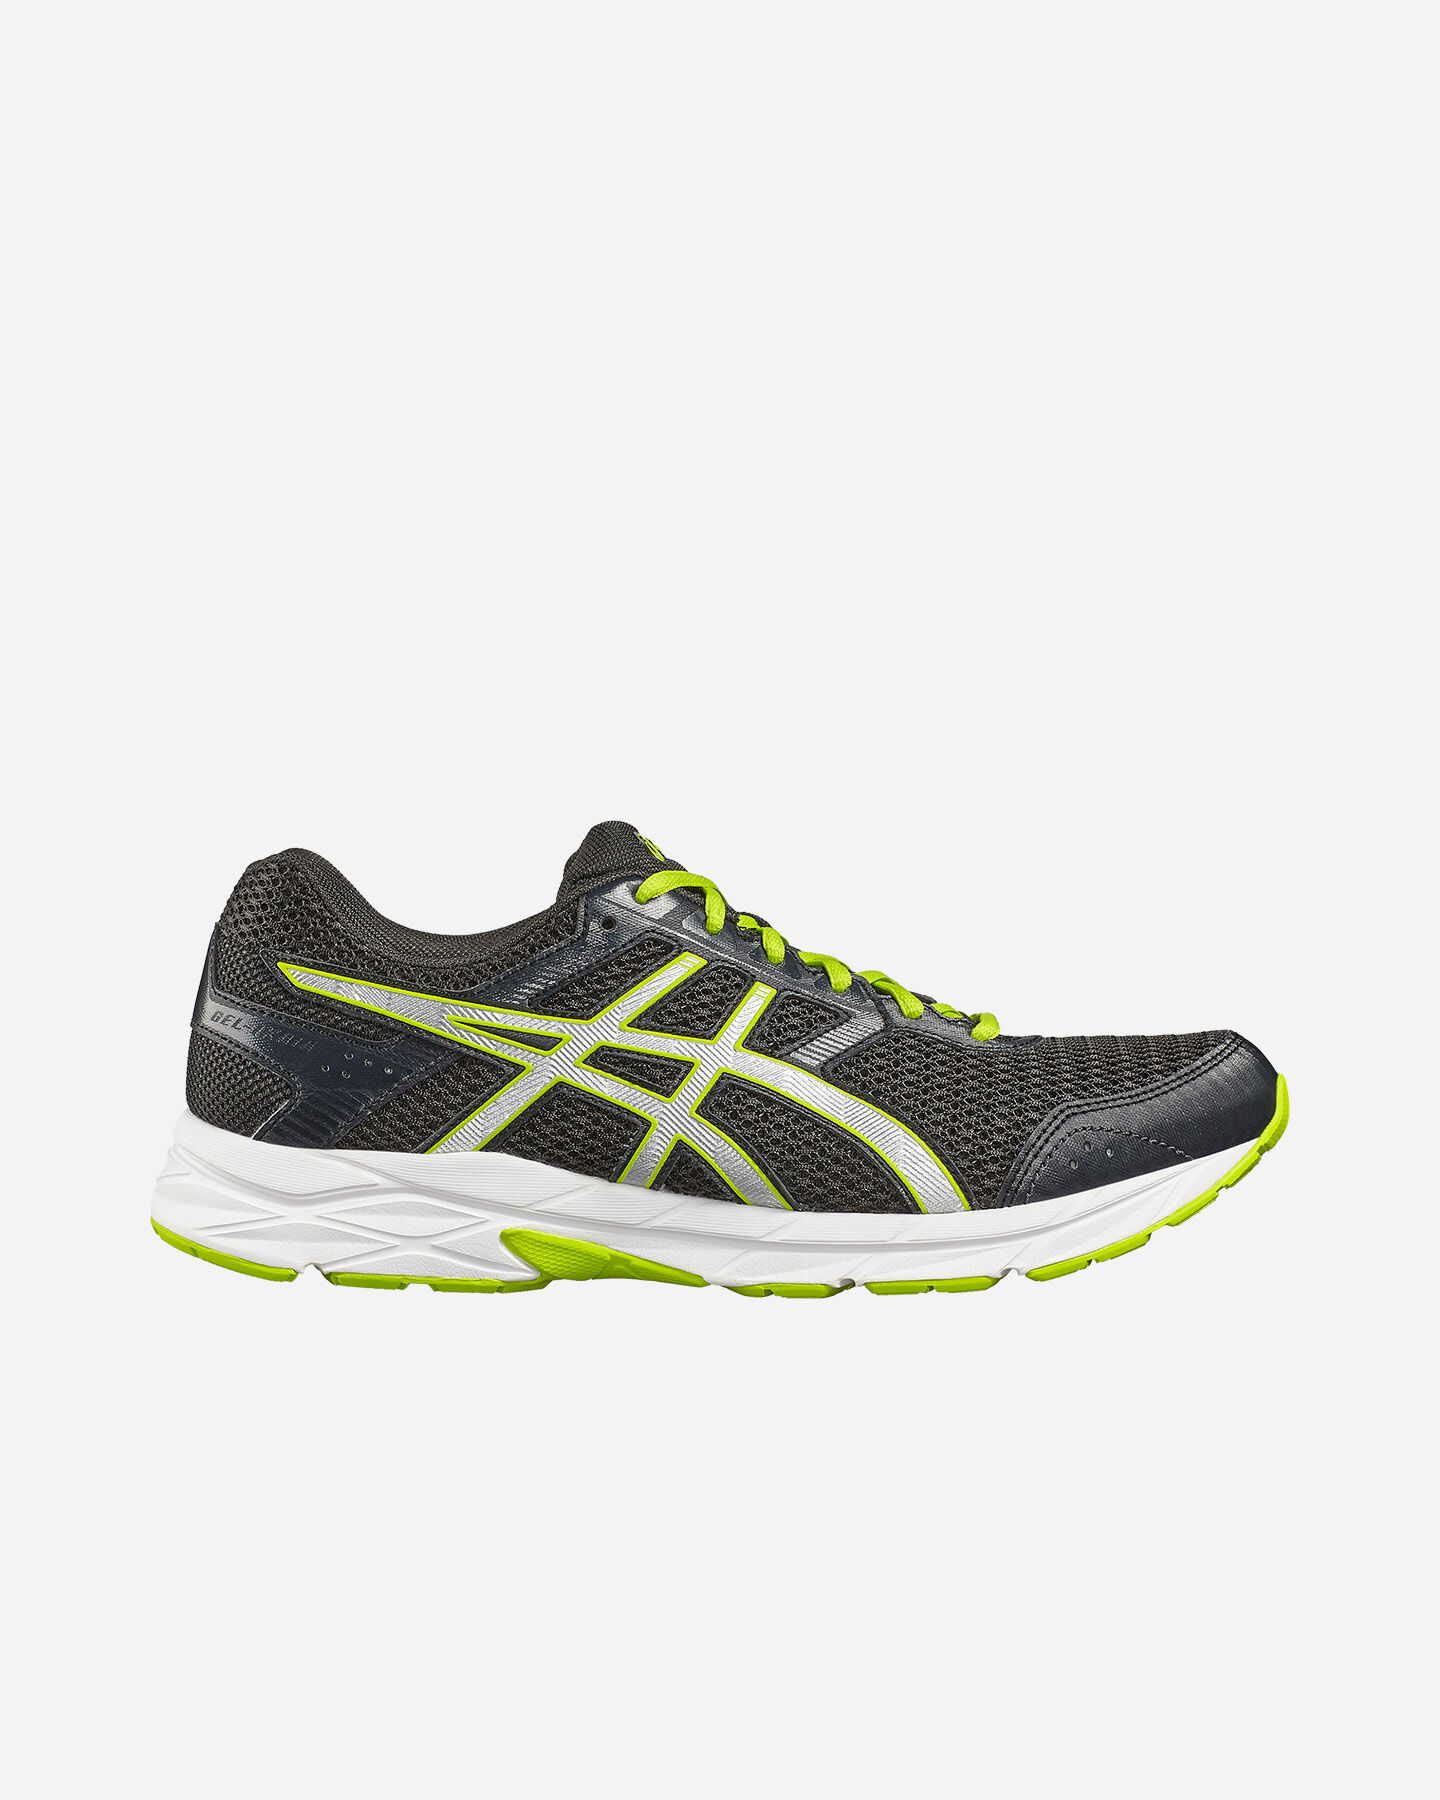 scarpe running asics categoria a3